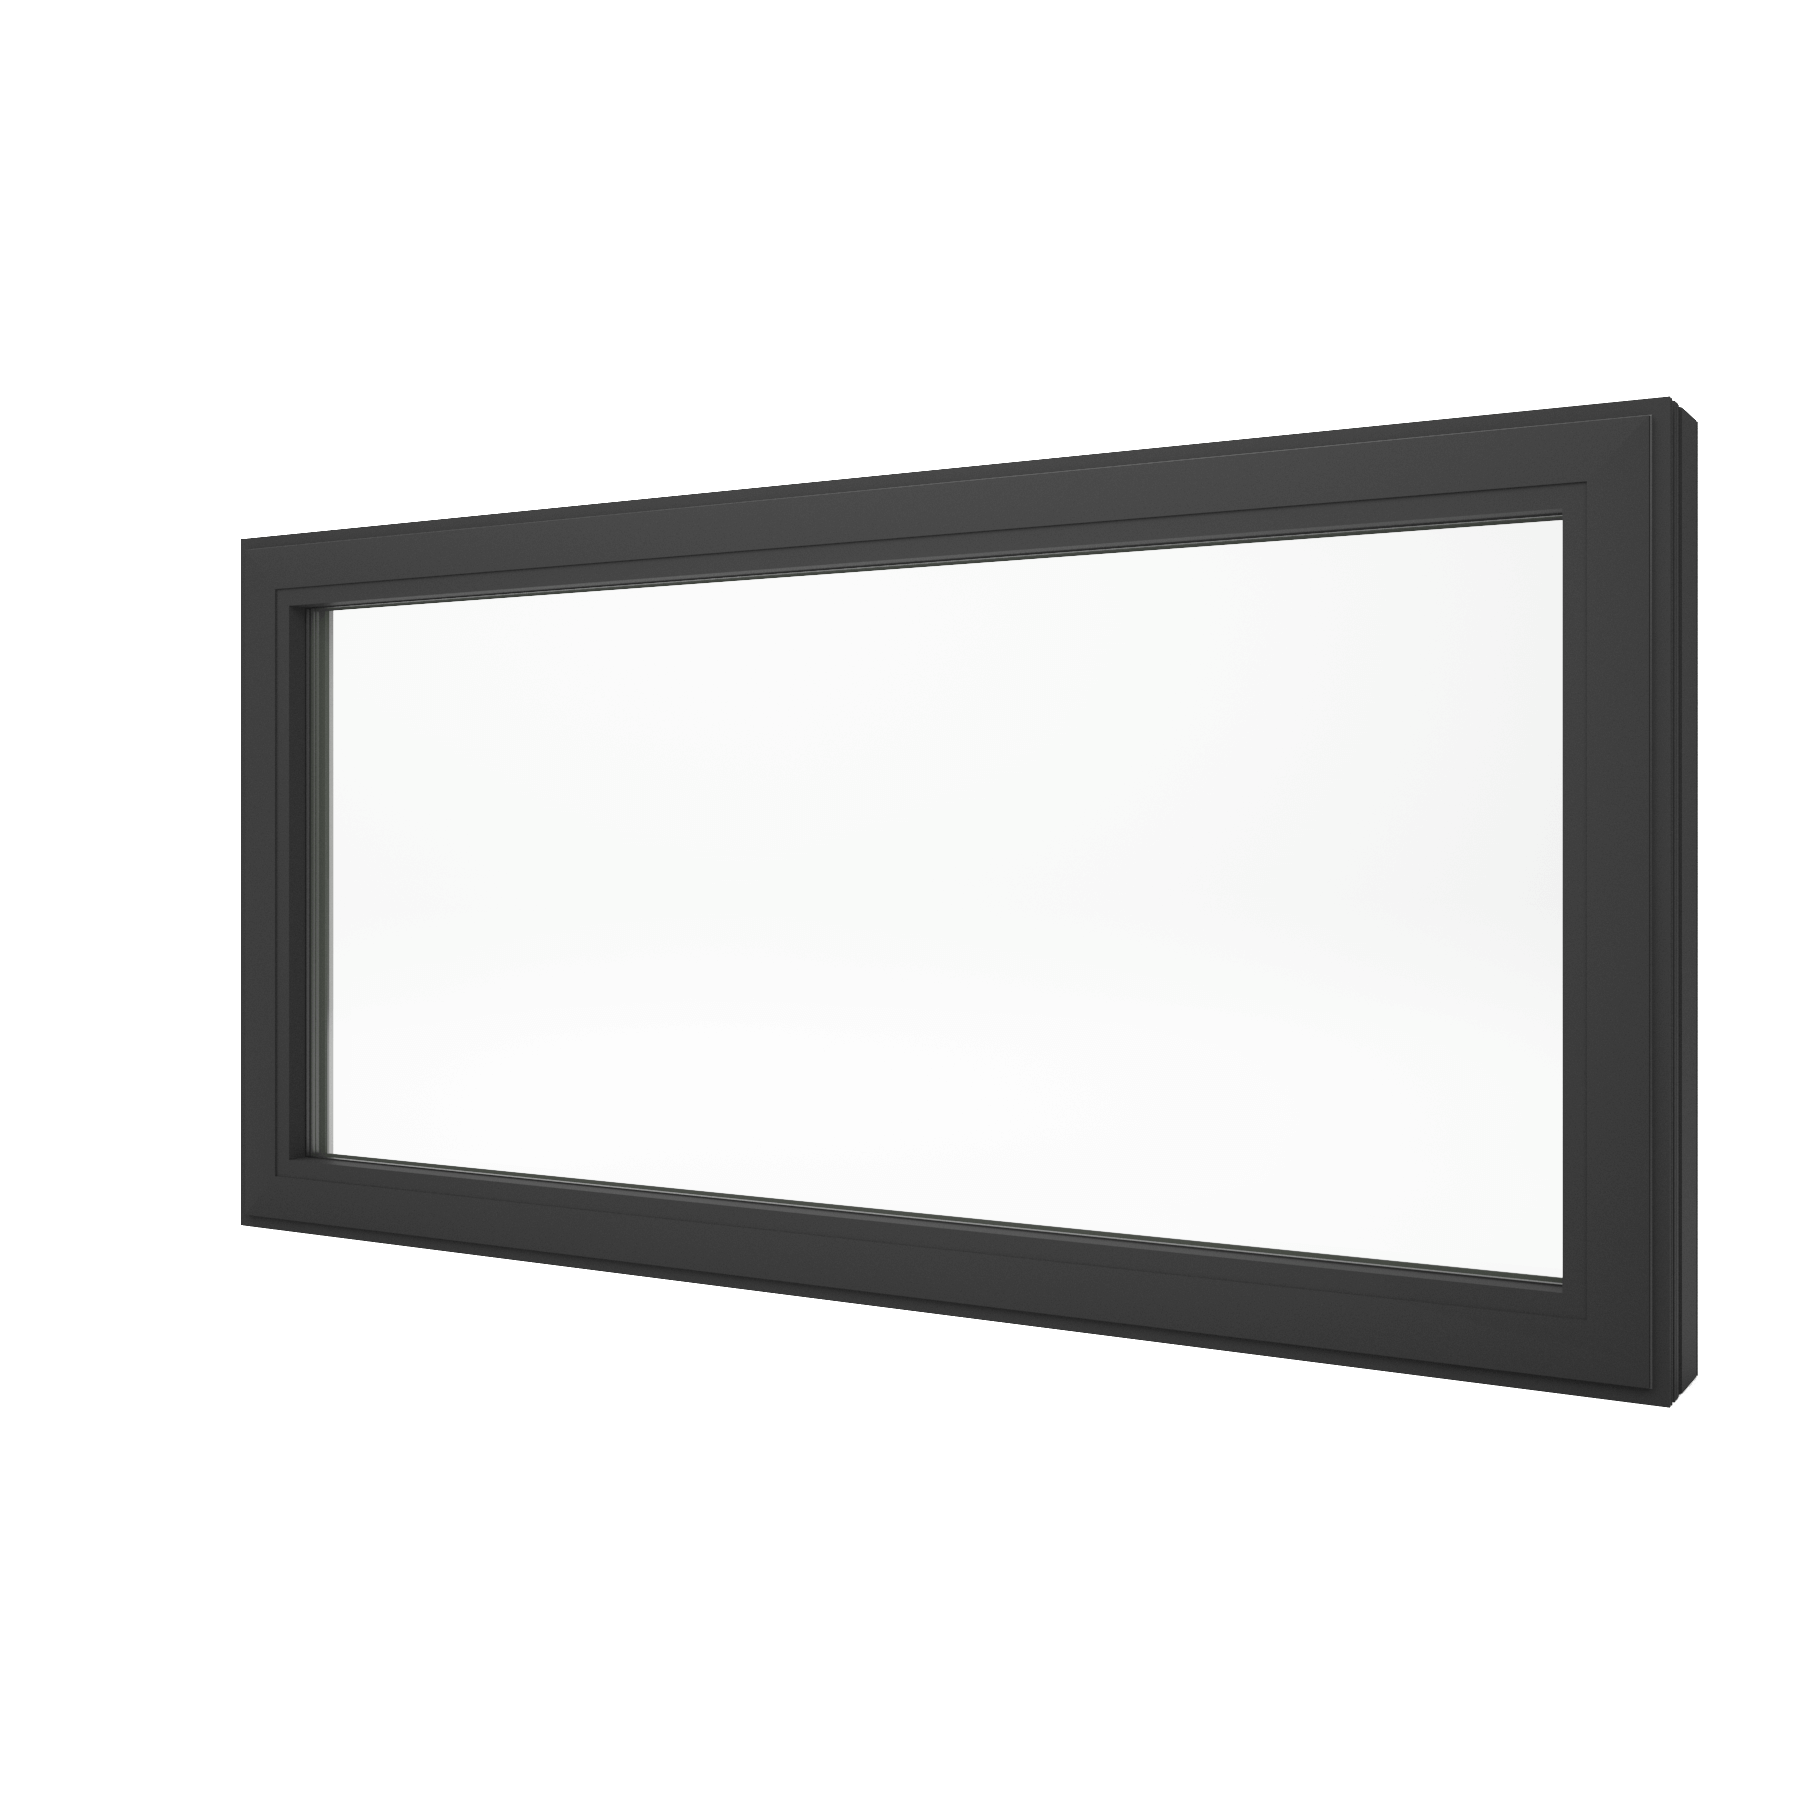 Awning-Window-black-closed